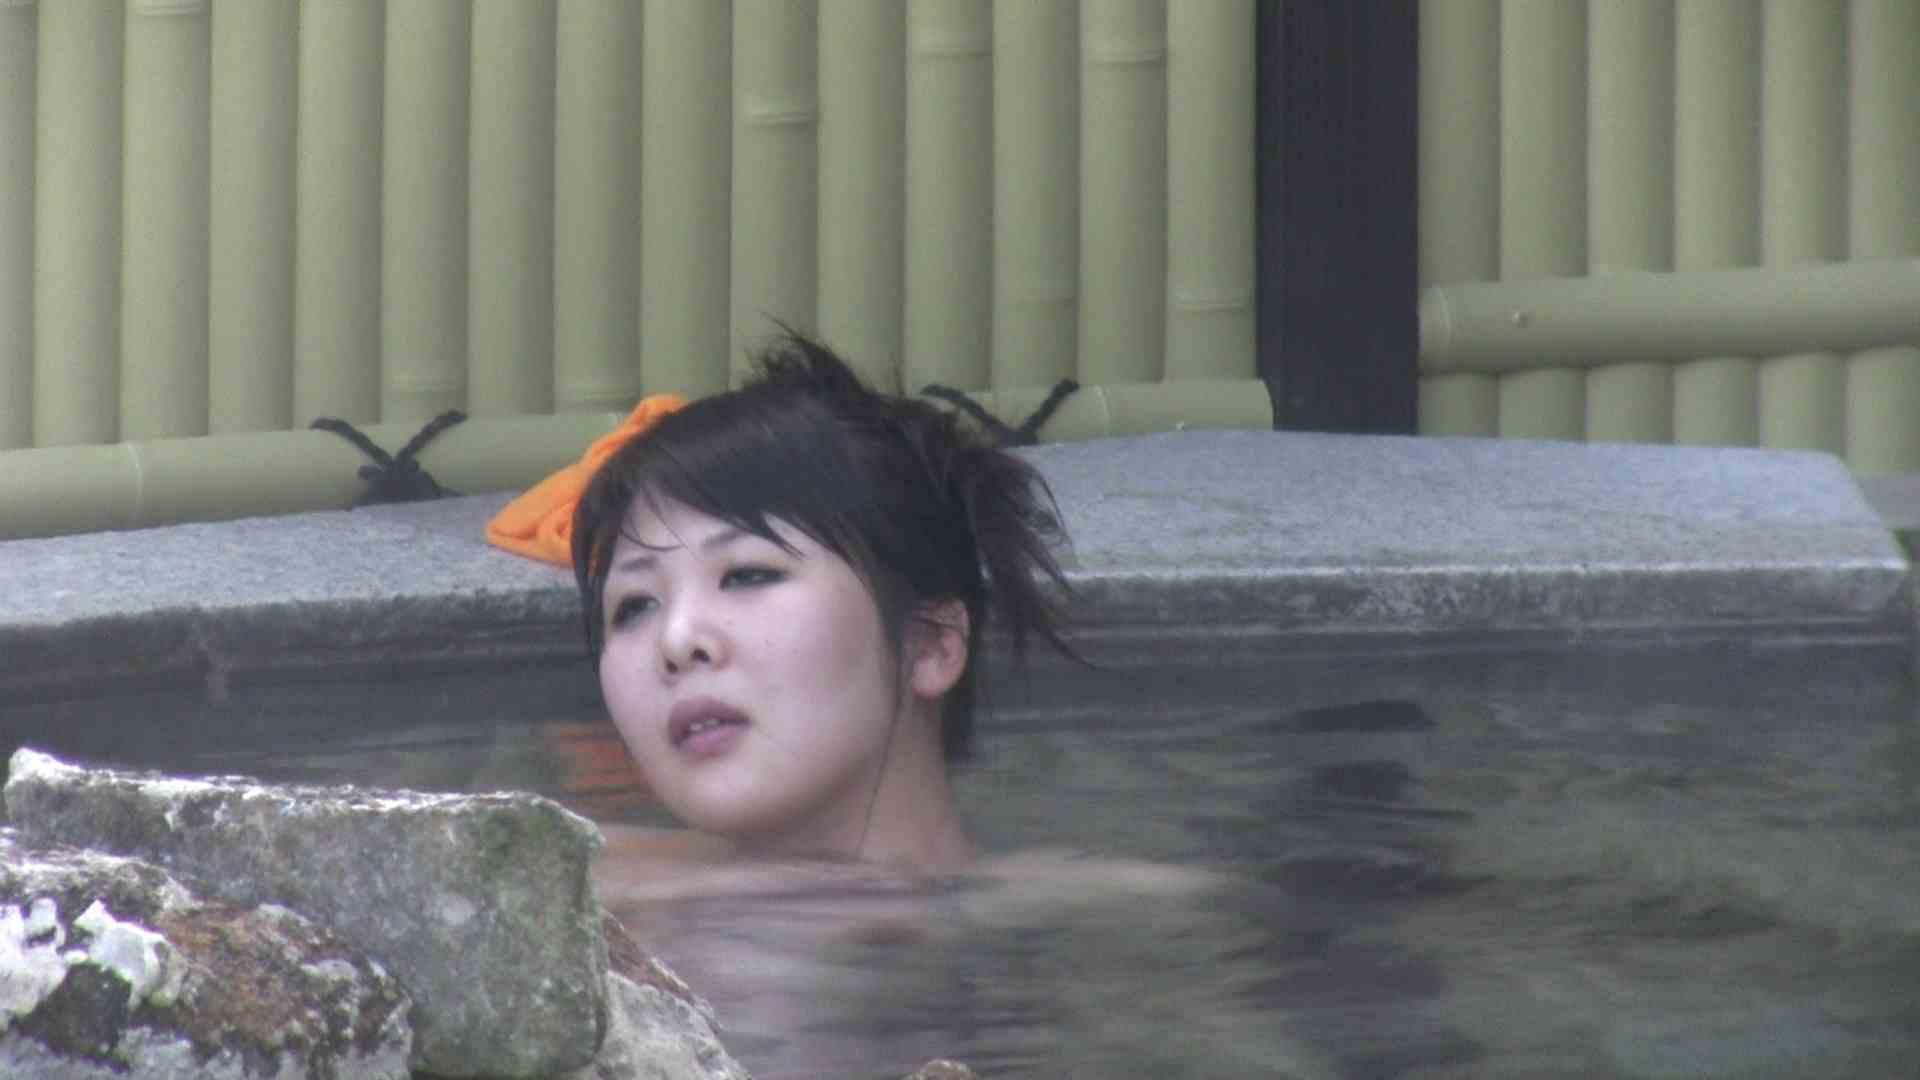 Aquaな露天風呂Vol.118 女体盗撮 隠し撮りAV無料 68連発 23